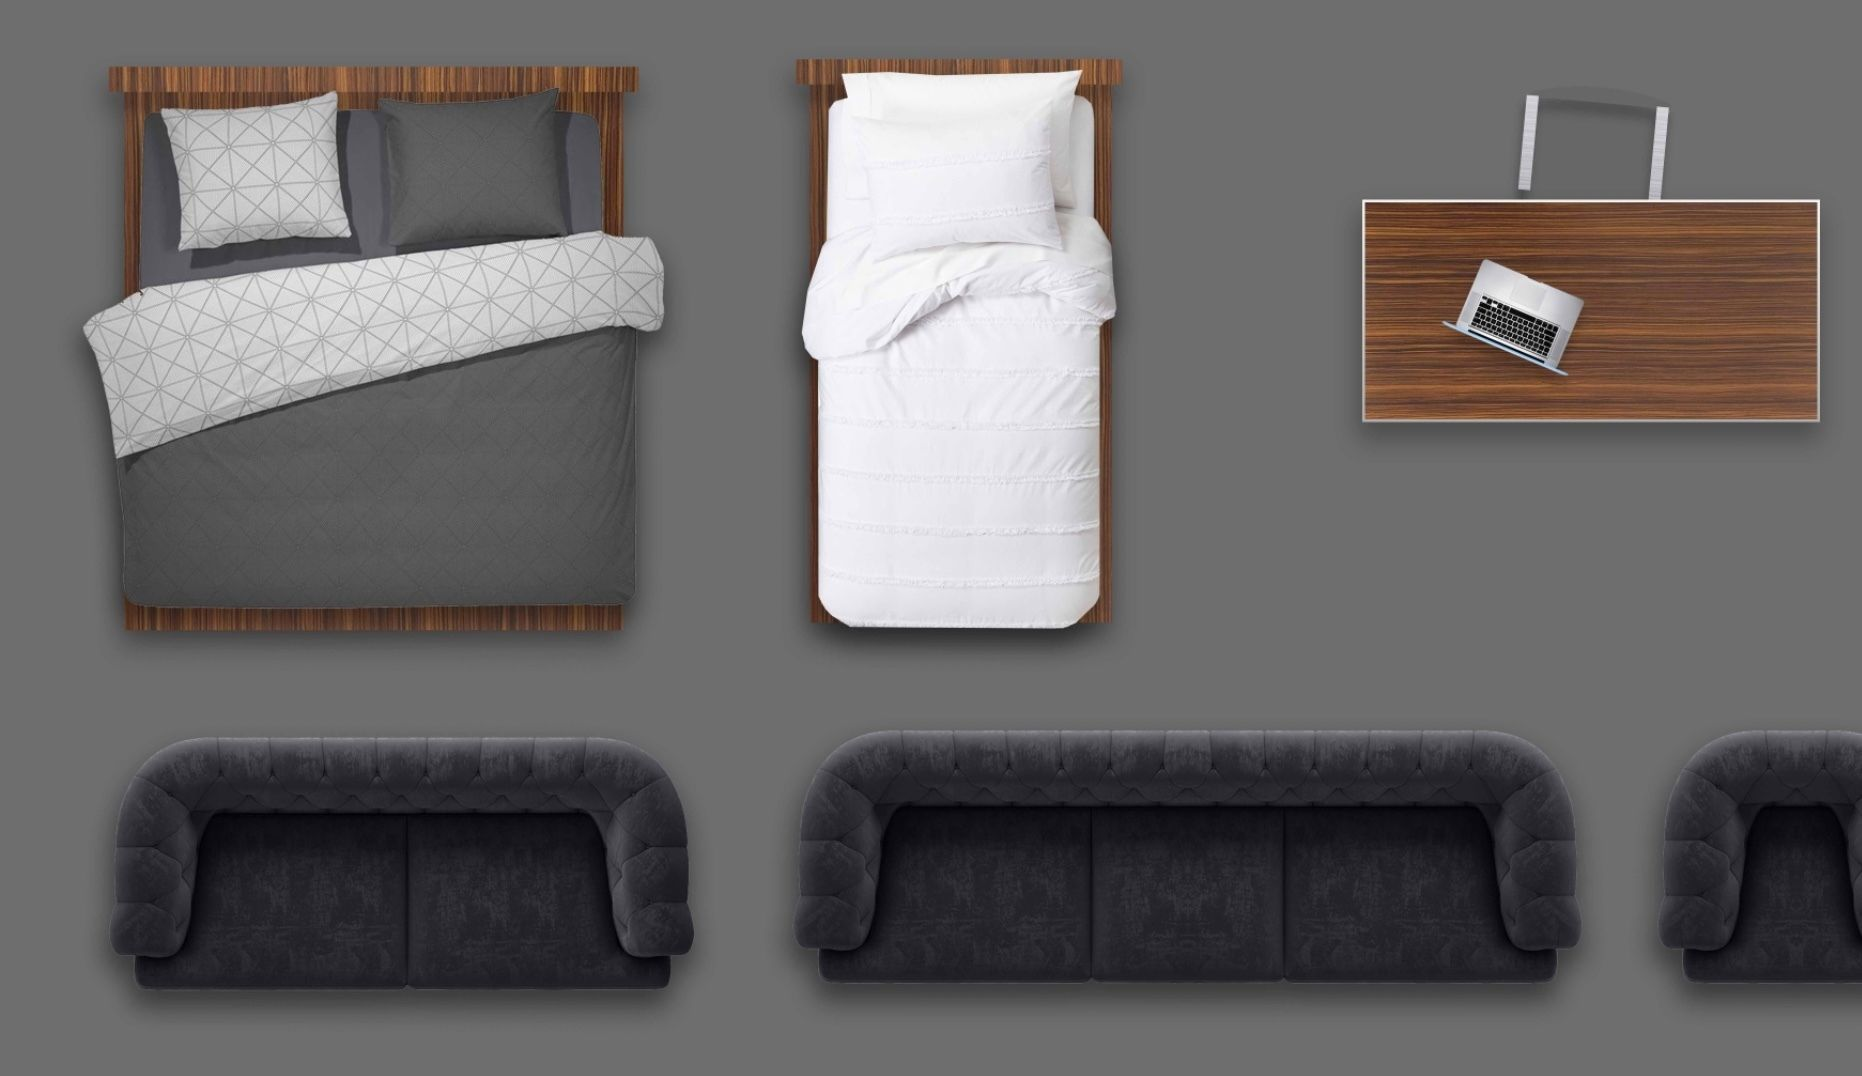 2d Furniture Floorplan Top View Psd 3d Model Render Top Plan Top